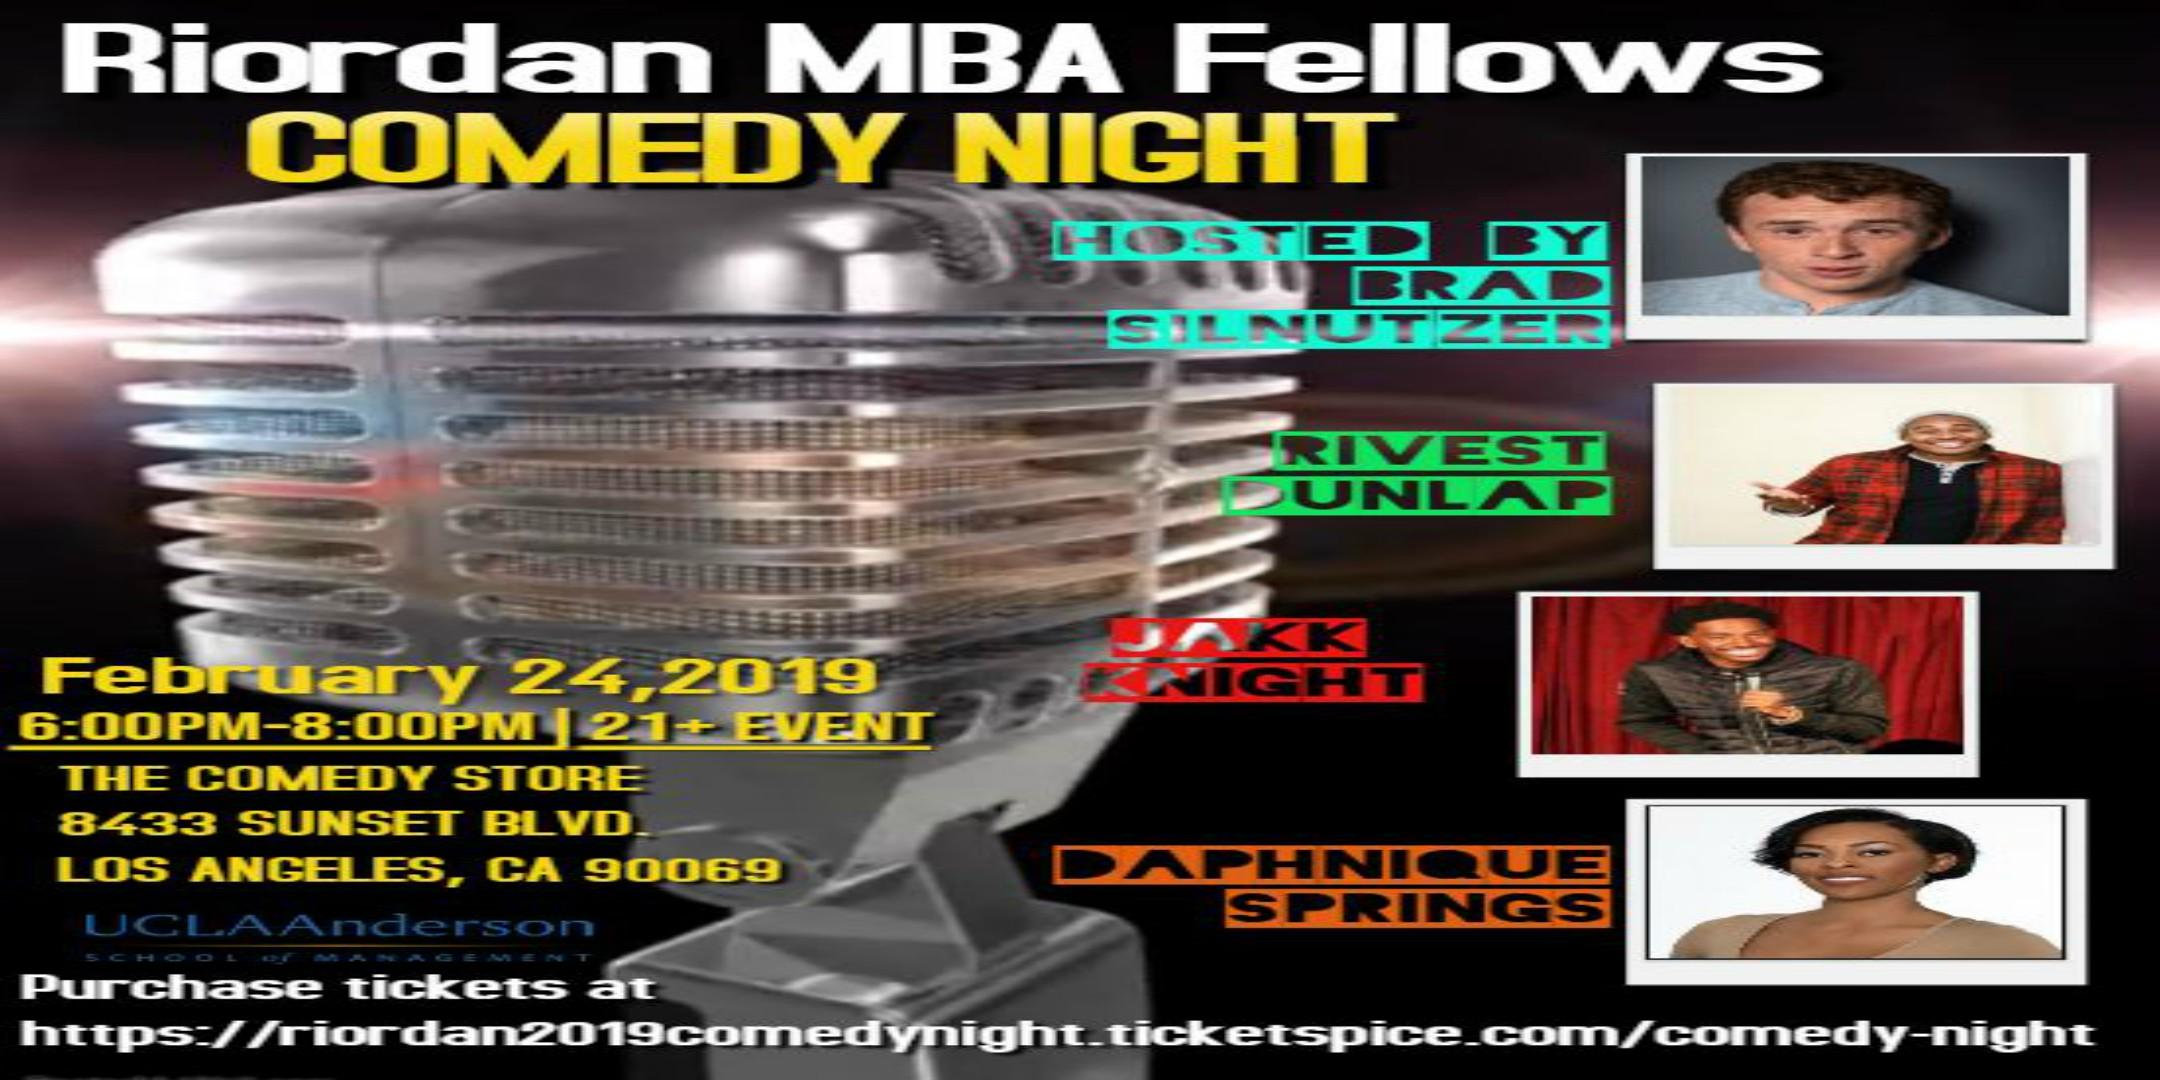 2019 Riordan MBA Fellows Comedy Night